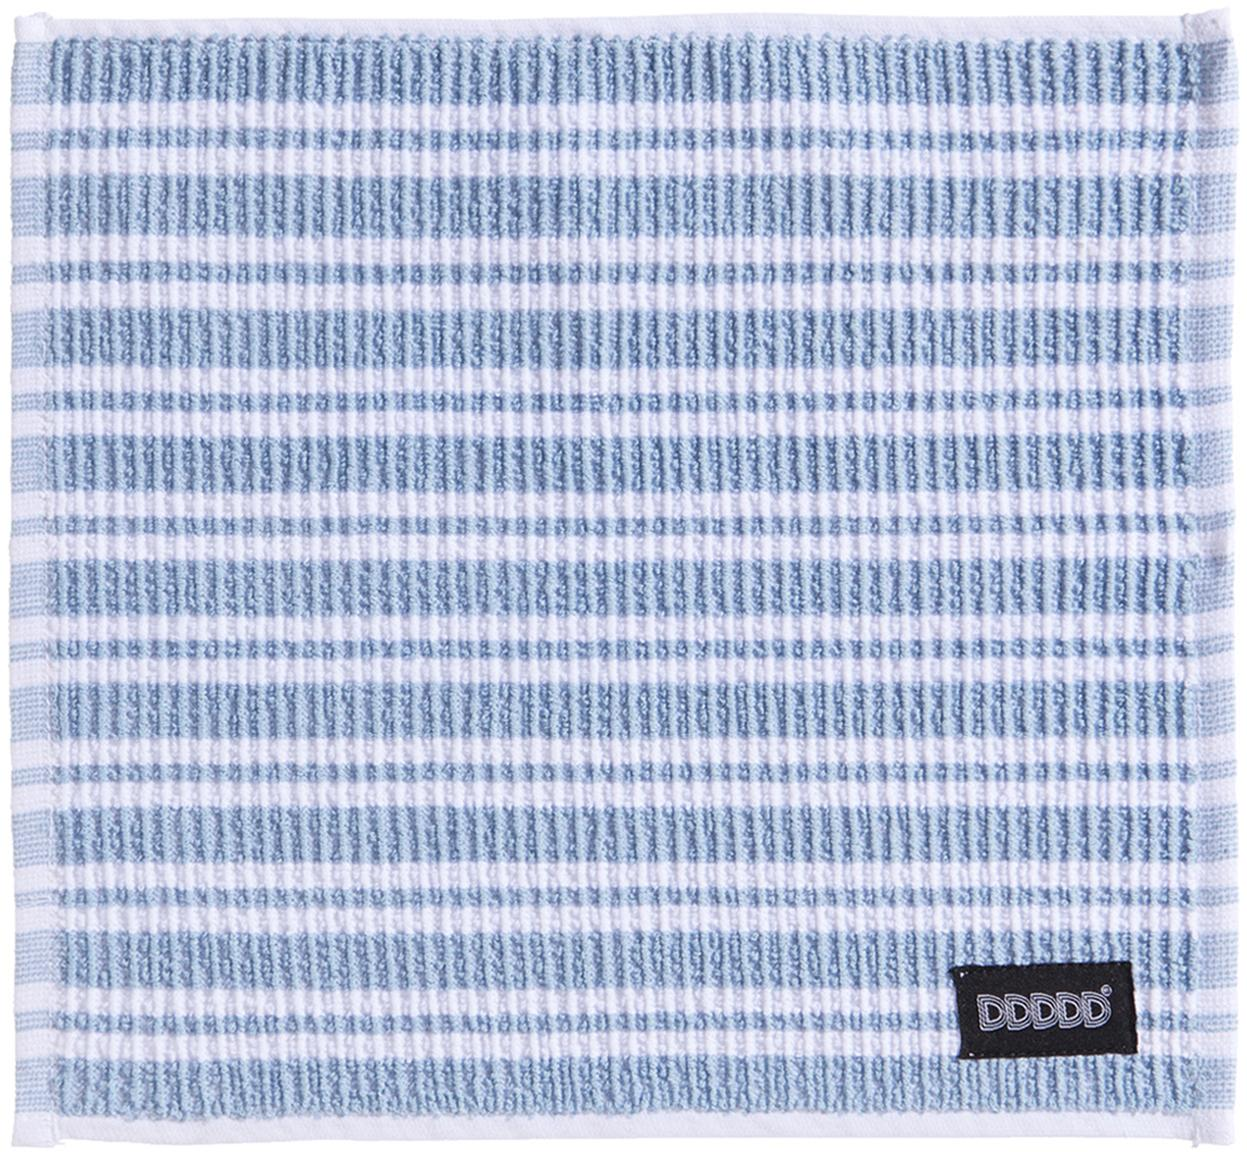 Panni assorbenti Basic Clean 4 pz, Cotone, Blu, bianco, Larg. 30 x Lung. 30 cm